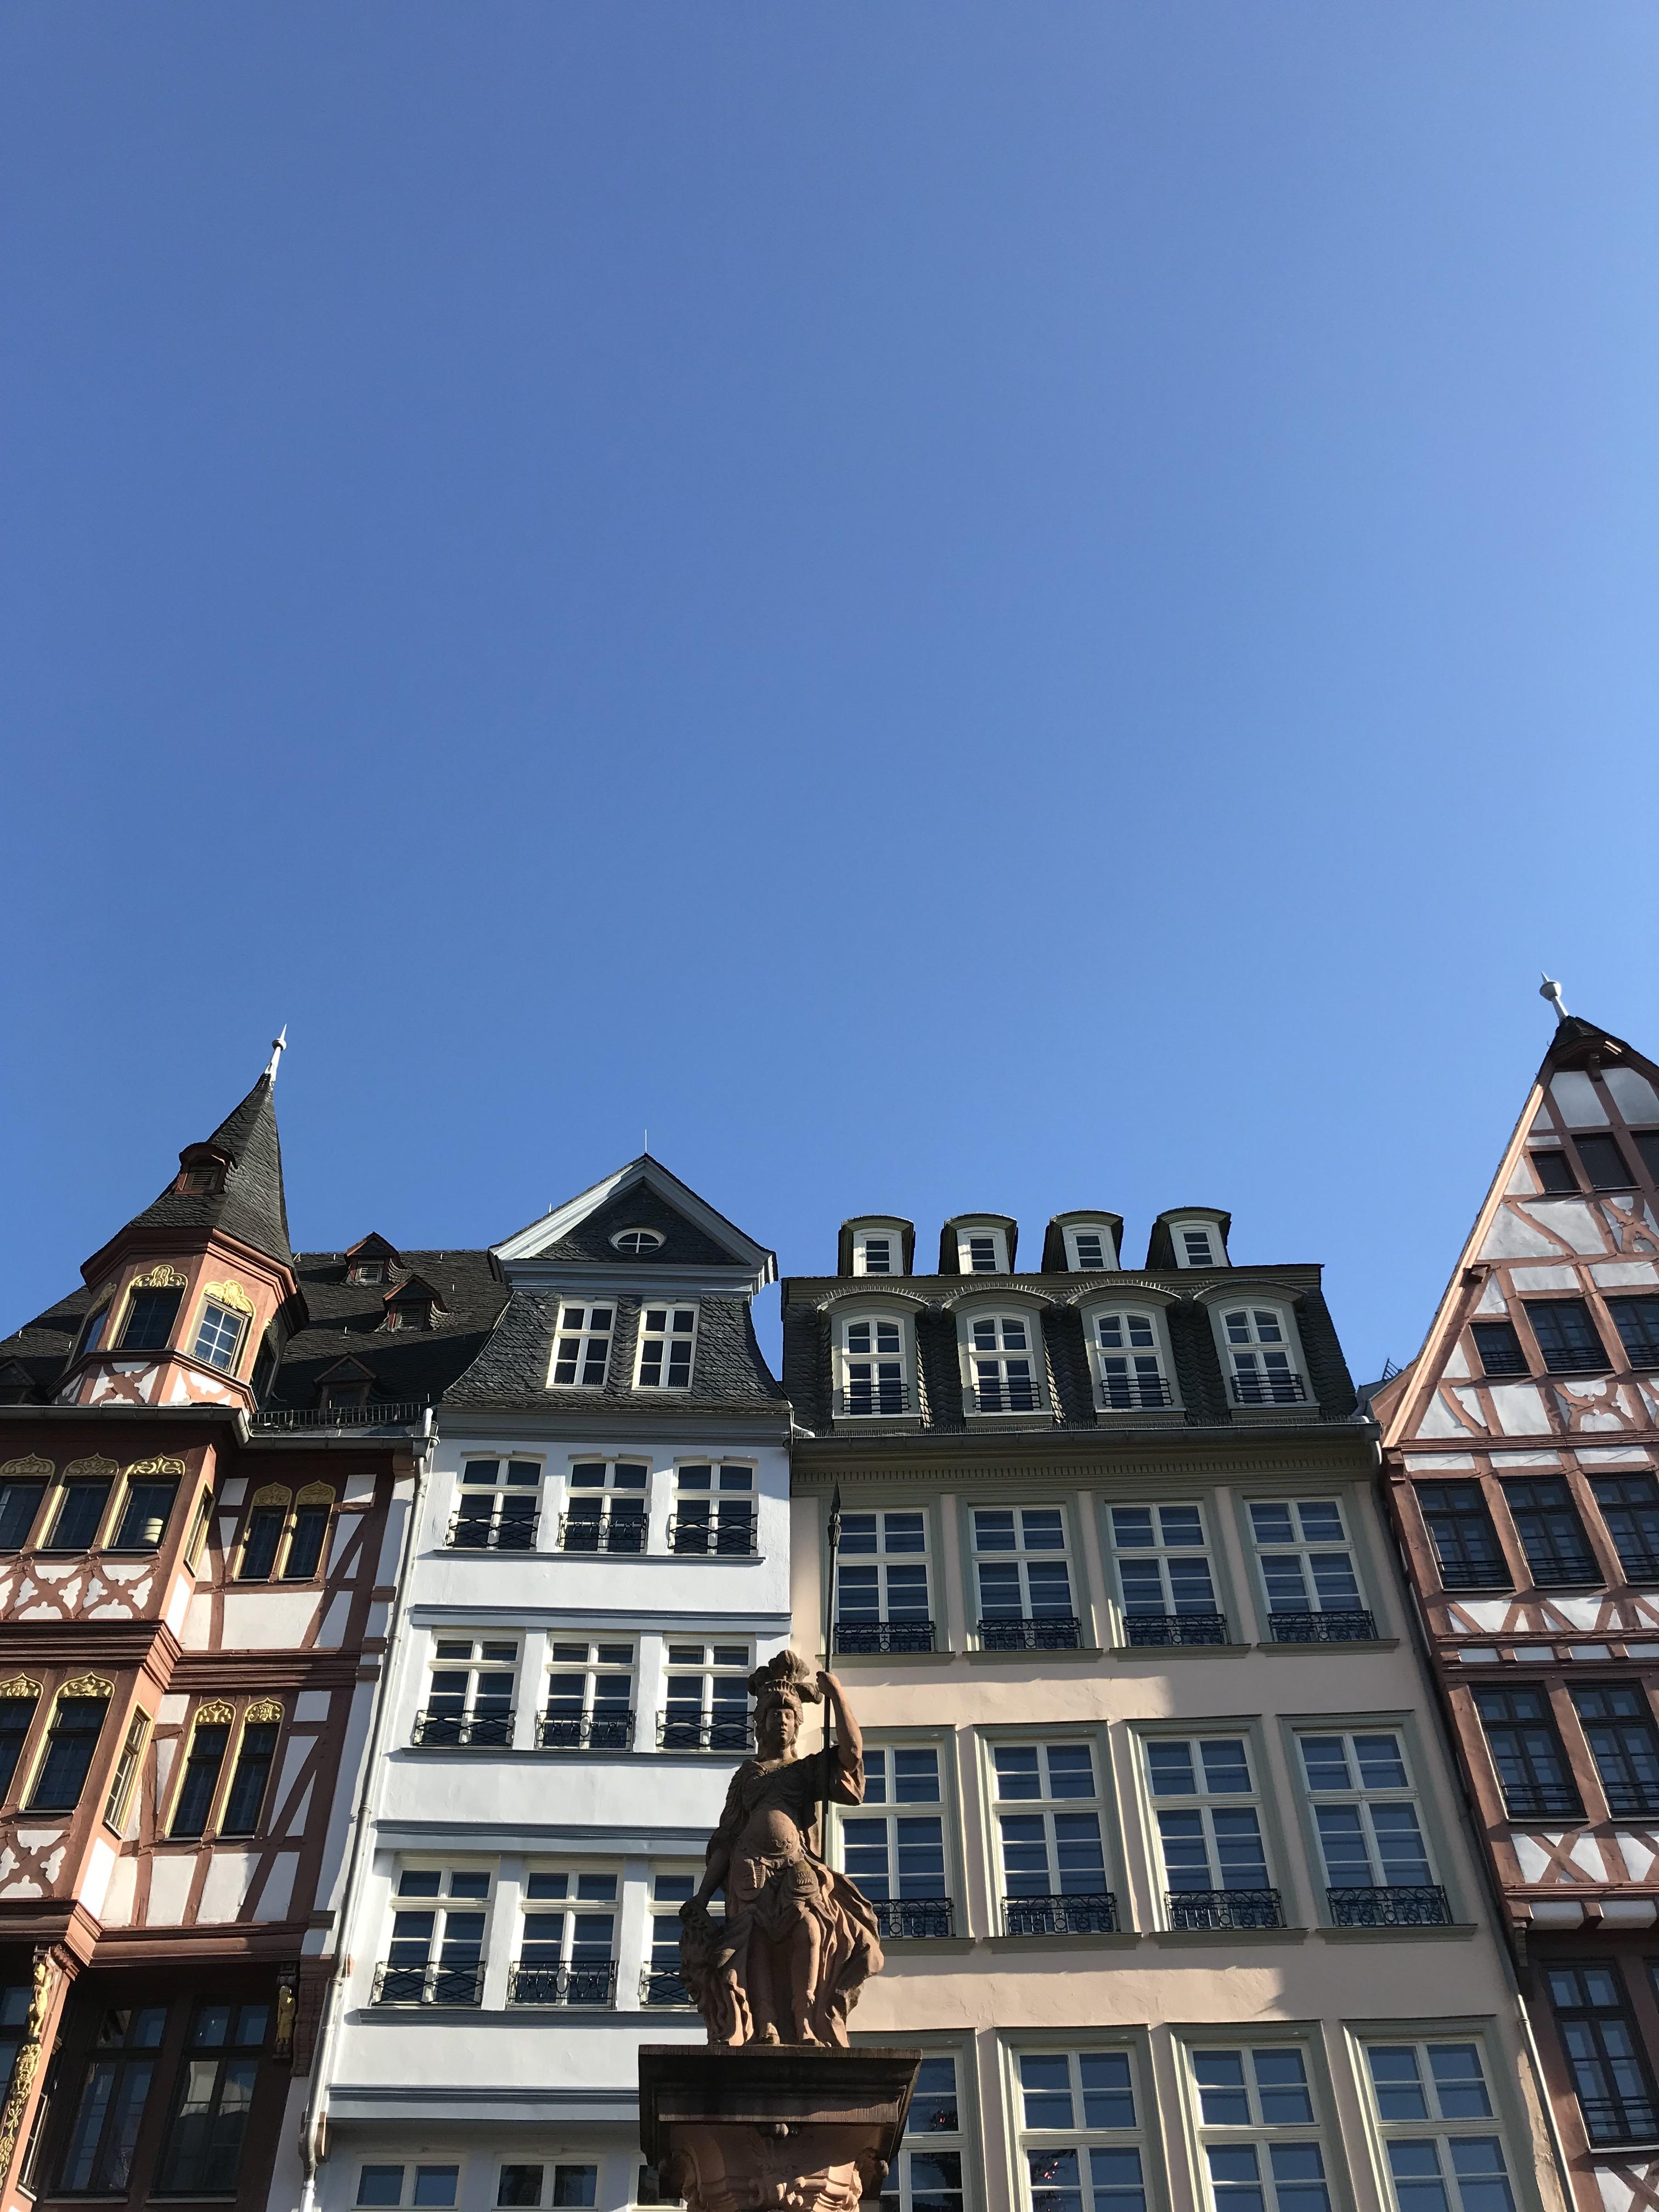 piazza-römerberg-francoforte-hessen-germania